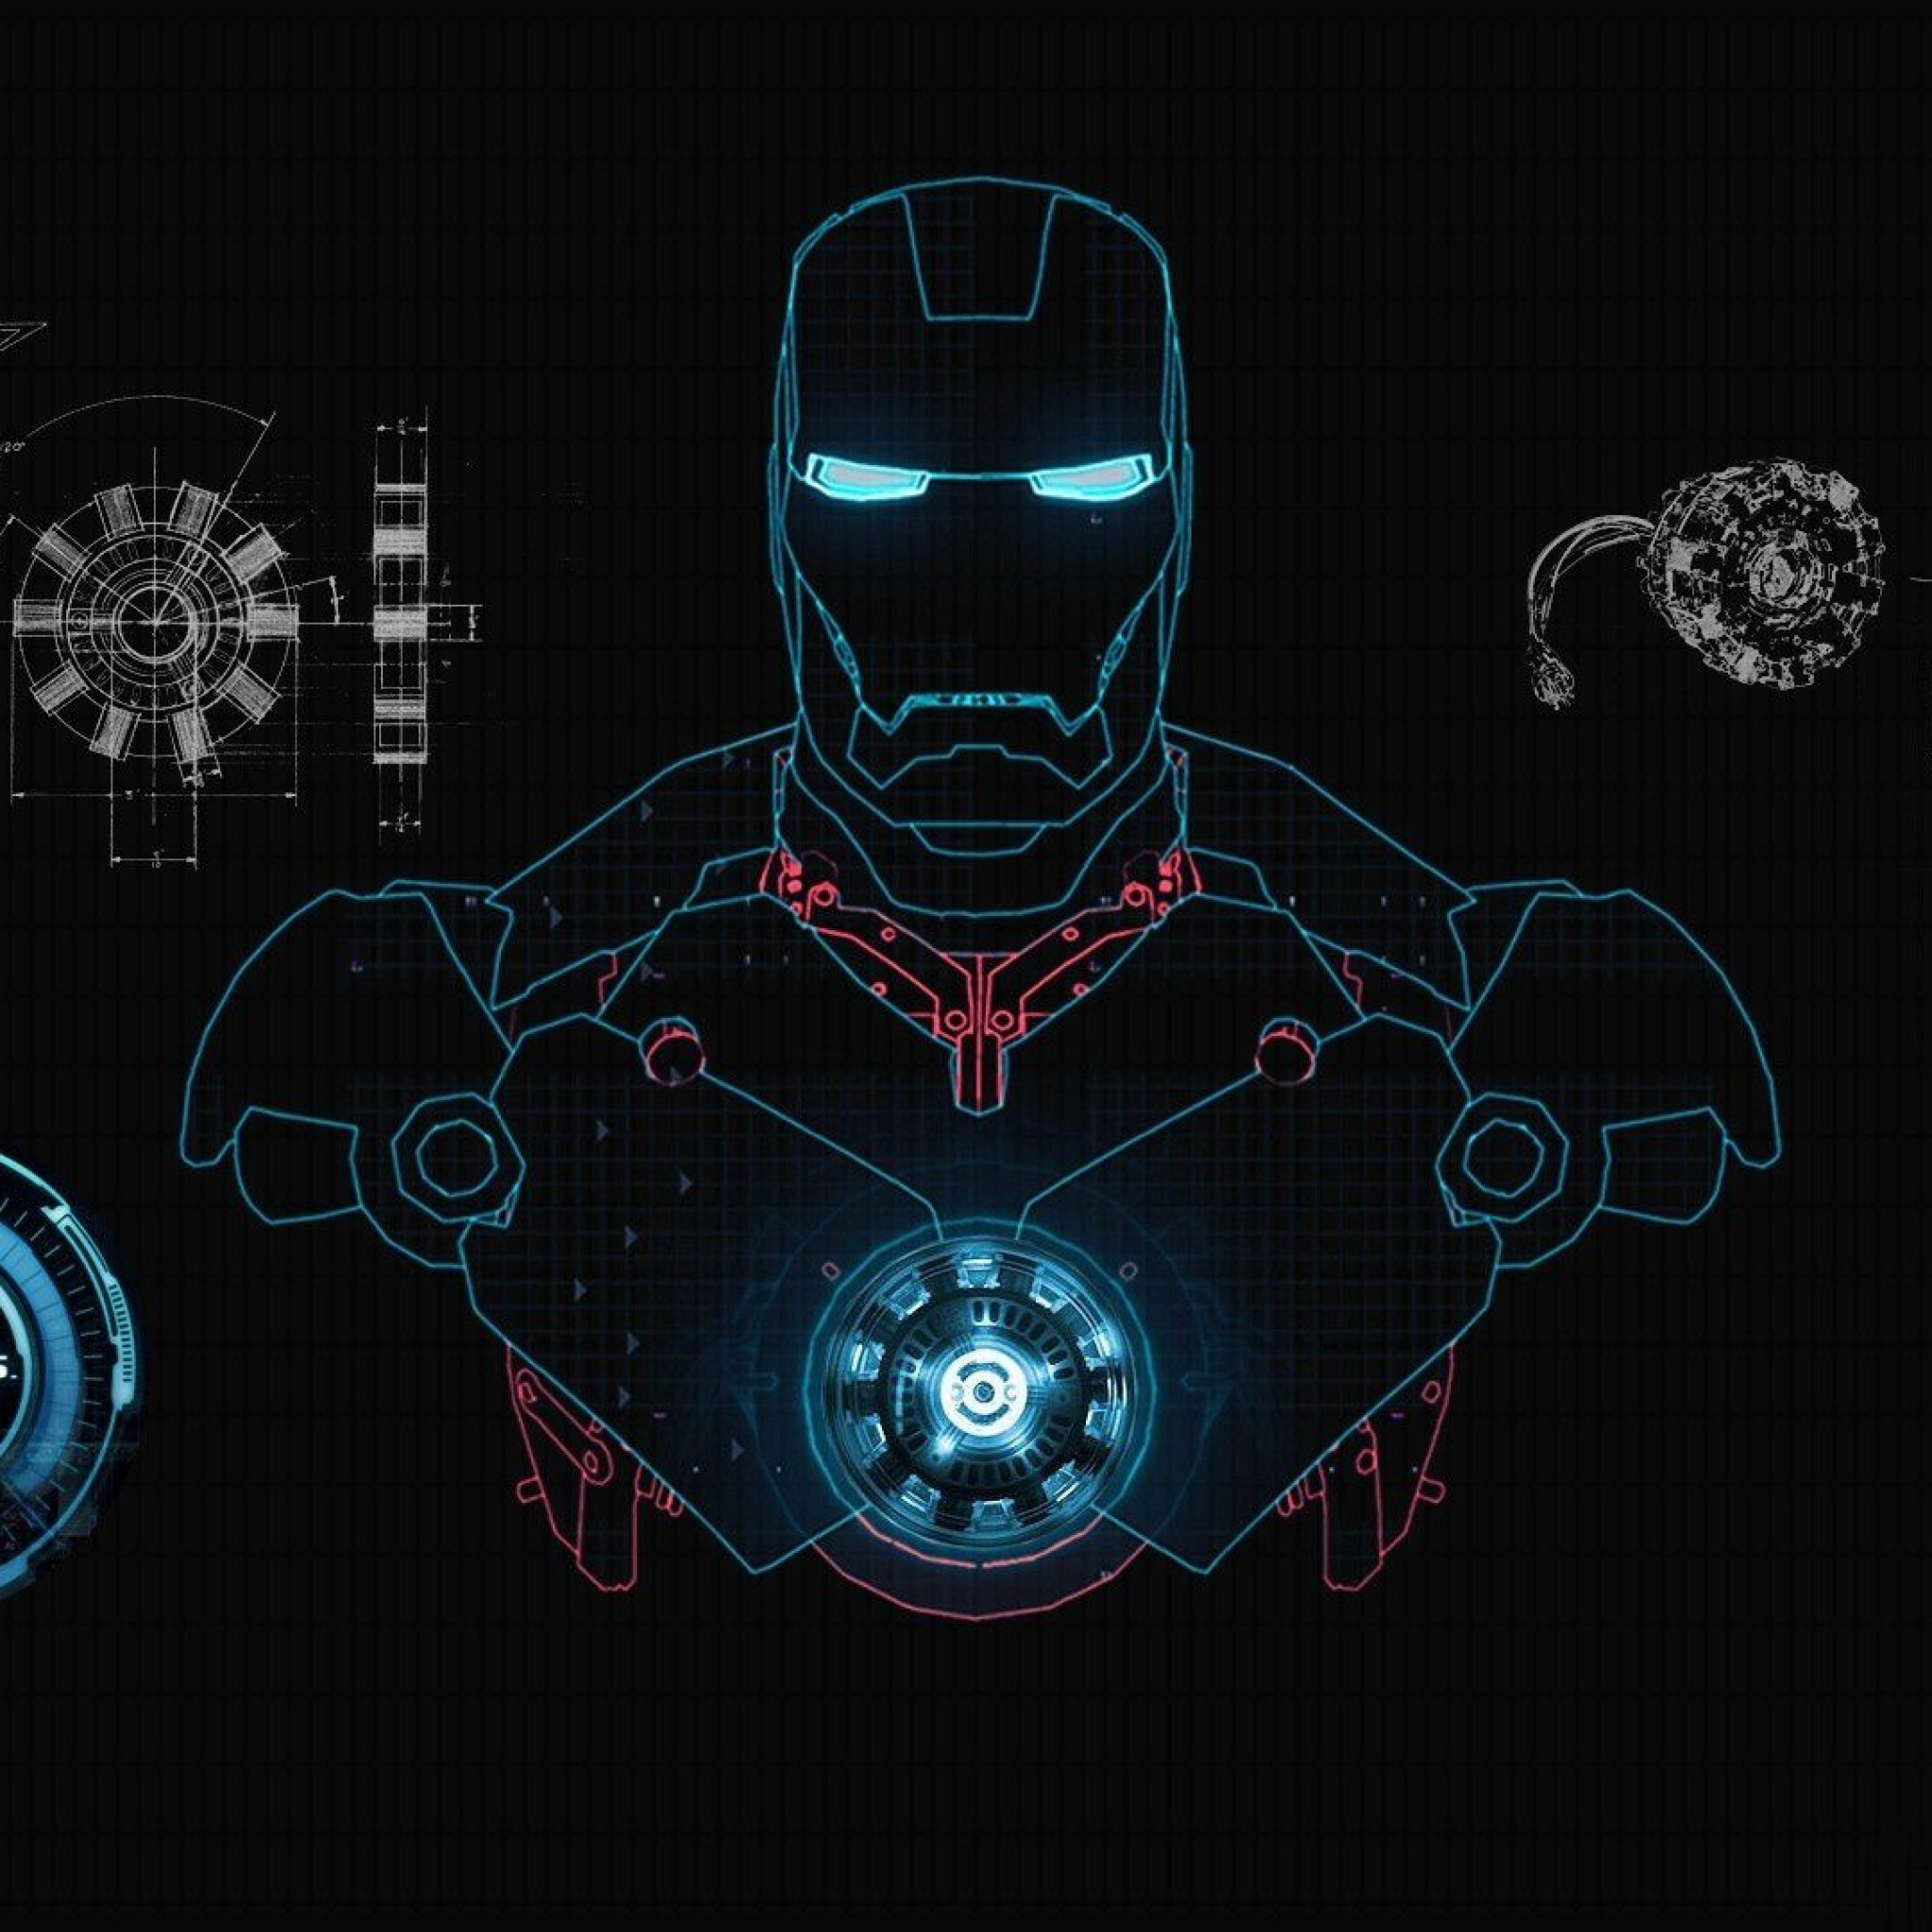 Iron Man Wallpaper 4k Iphone Bestpicture1org